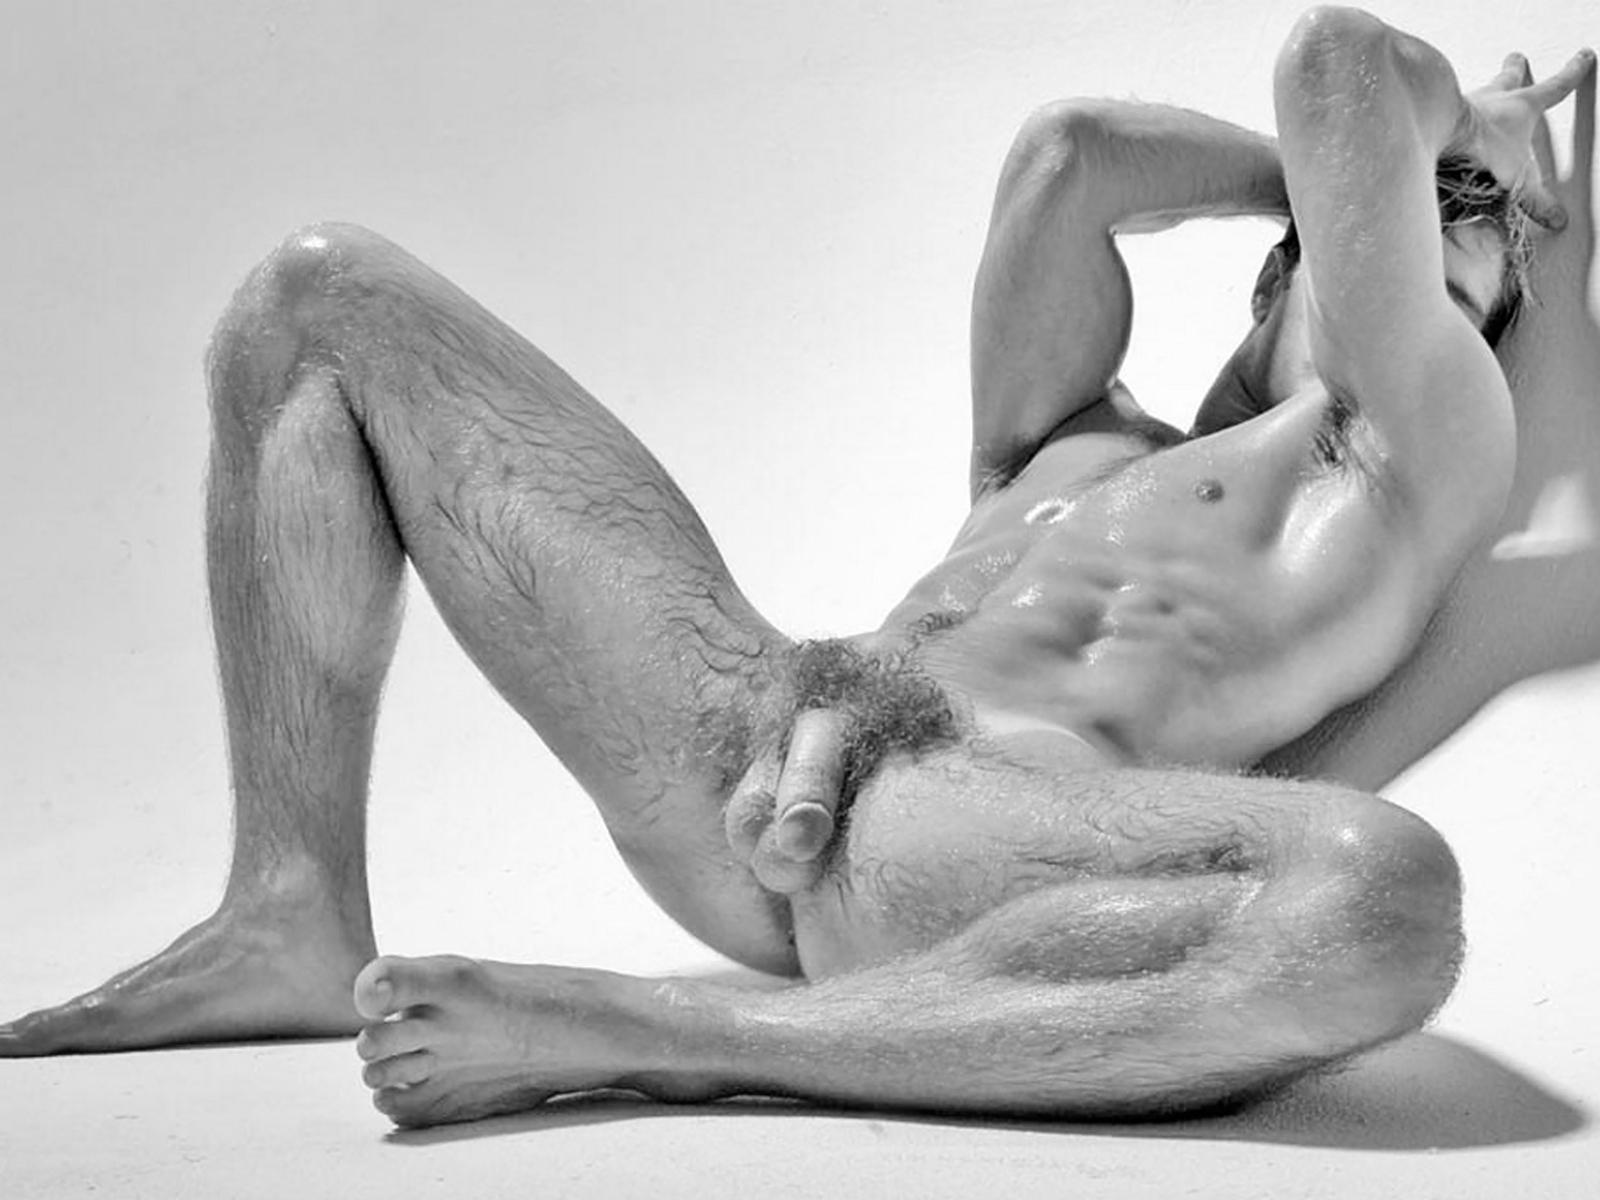 free nude men wallpaper